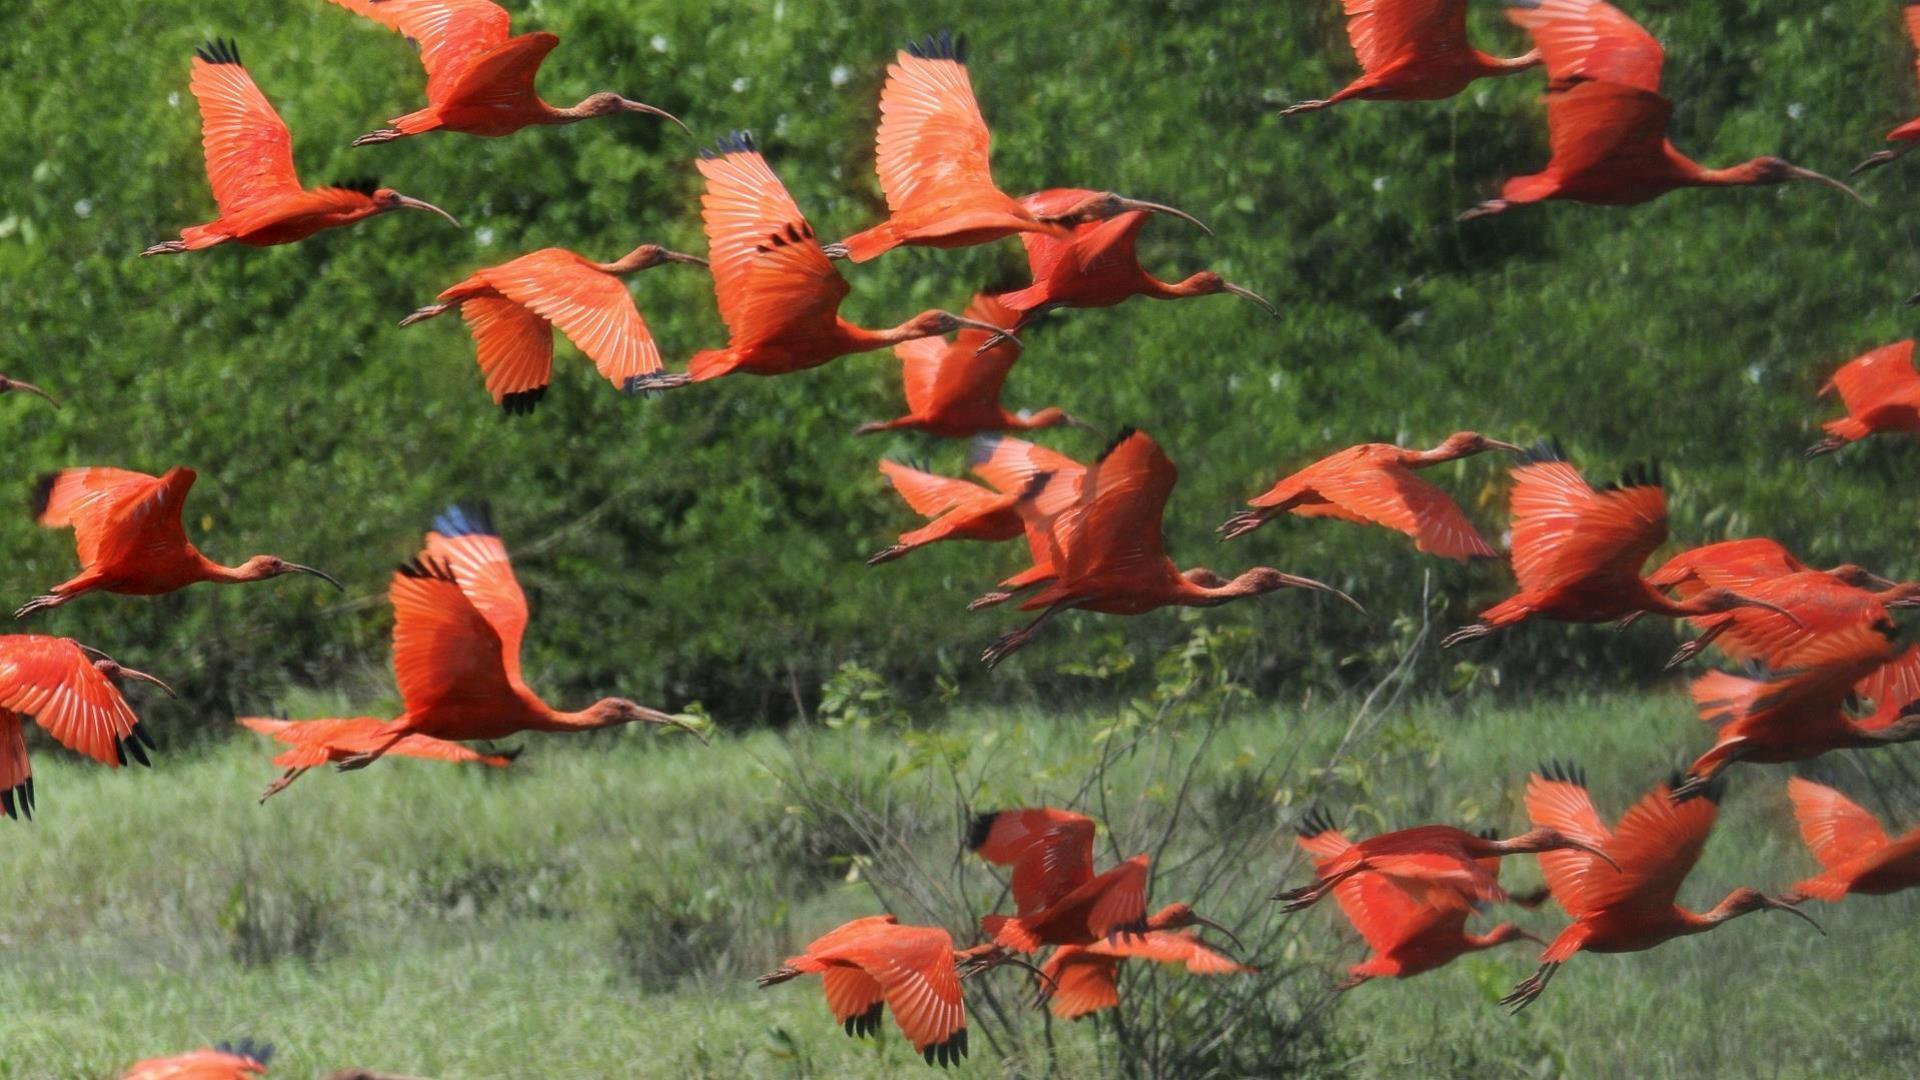 Brasilien | Belem, Ilha de Marajo: 5 Tage Reisebaustein - Belem & Ilha de Marajo naturnah erleben